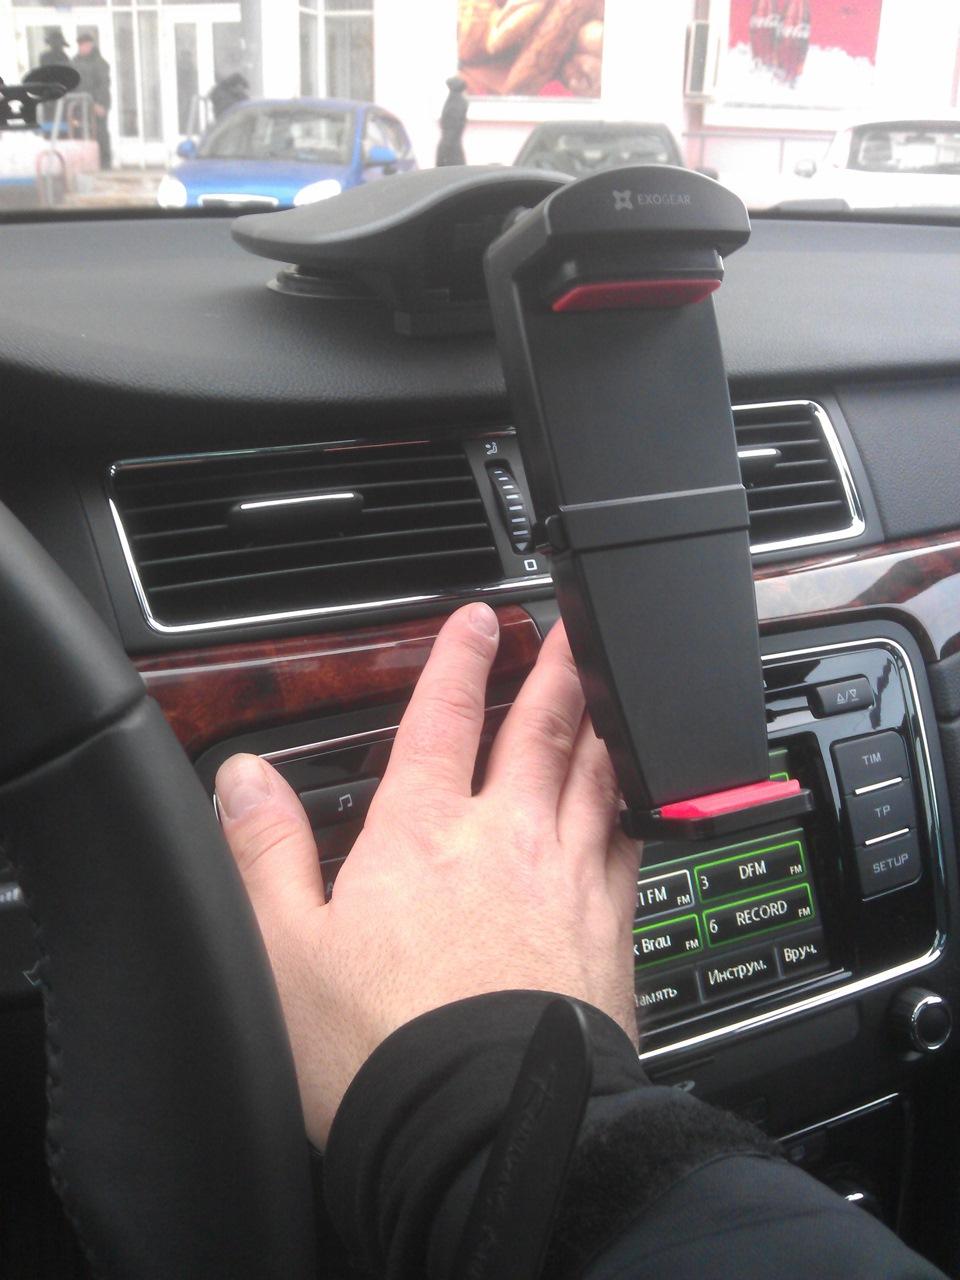 Найти держатель планшета android (андроид) combo dji mavic pro напряжение батарей